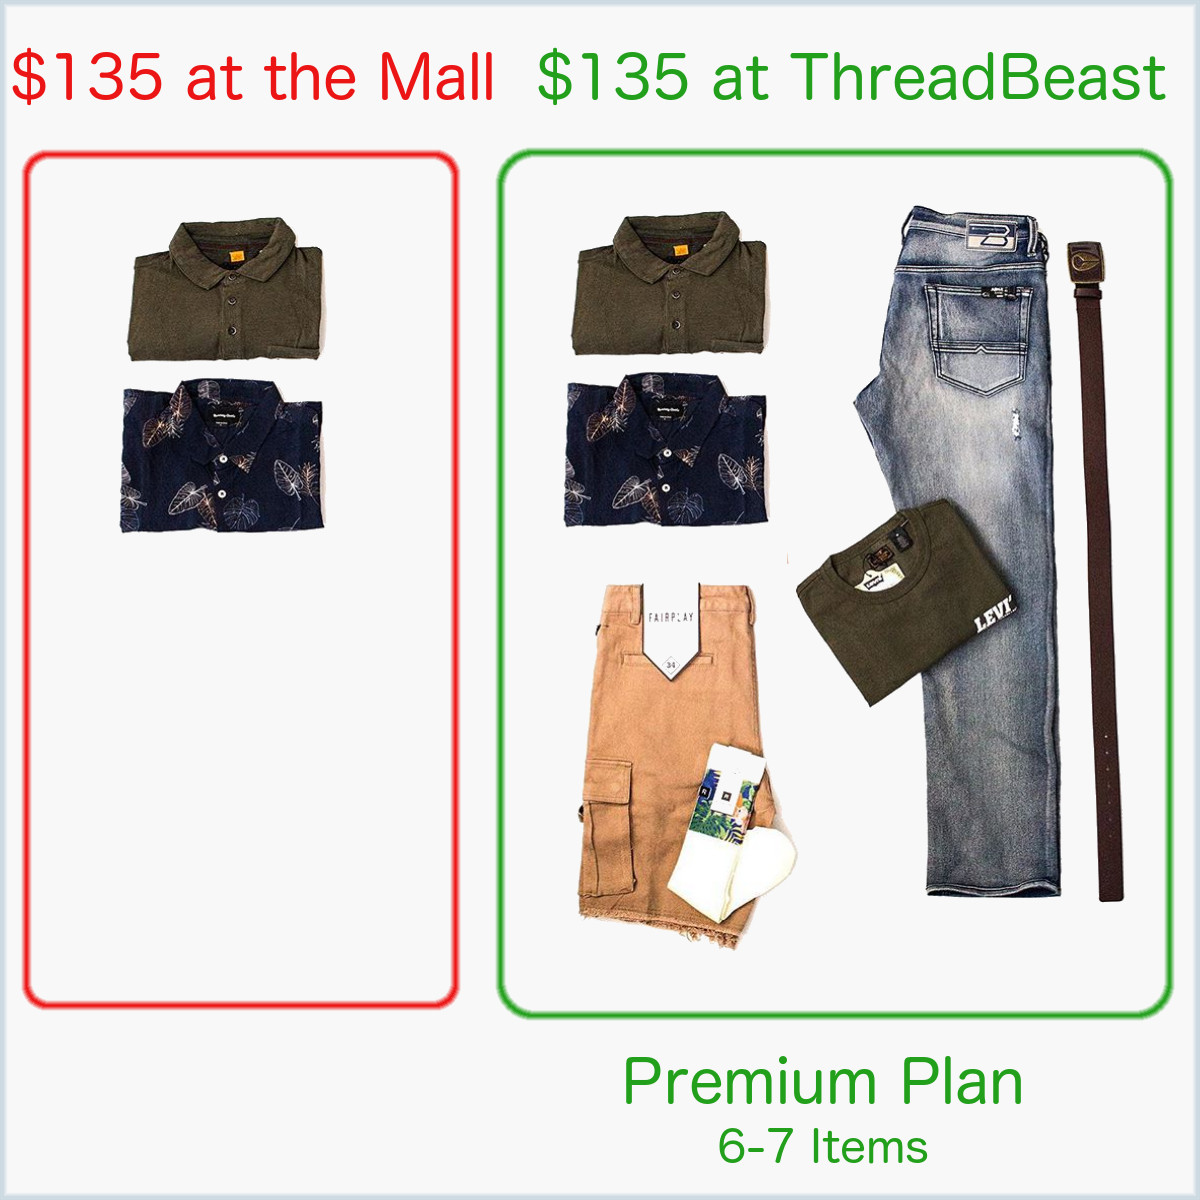 threadbeast135.jpg